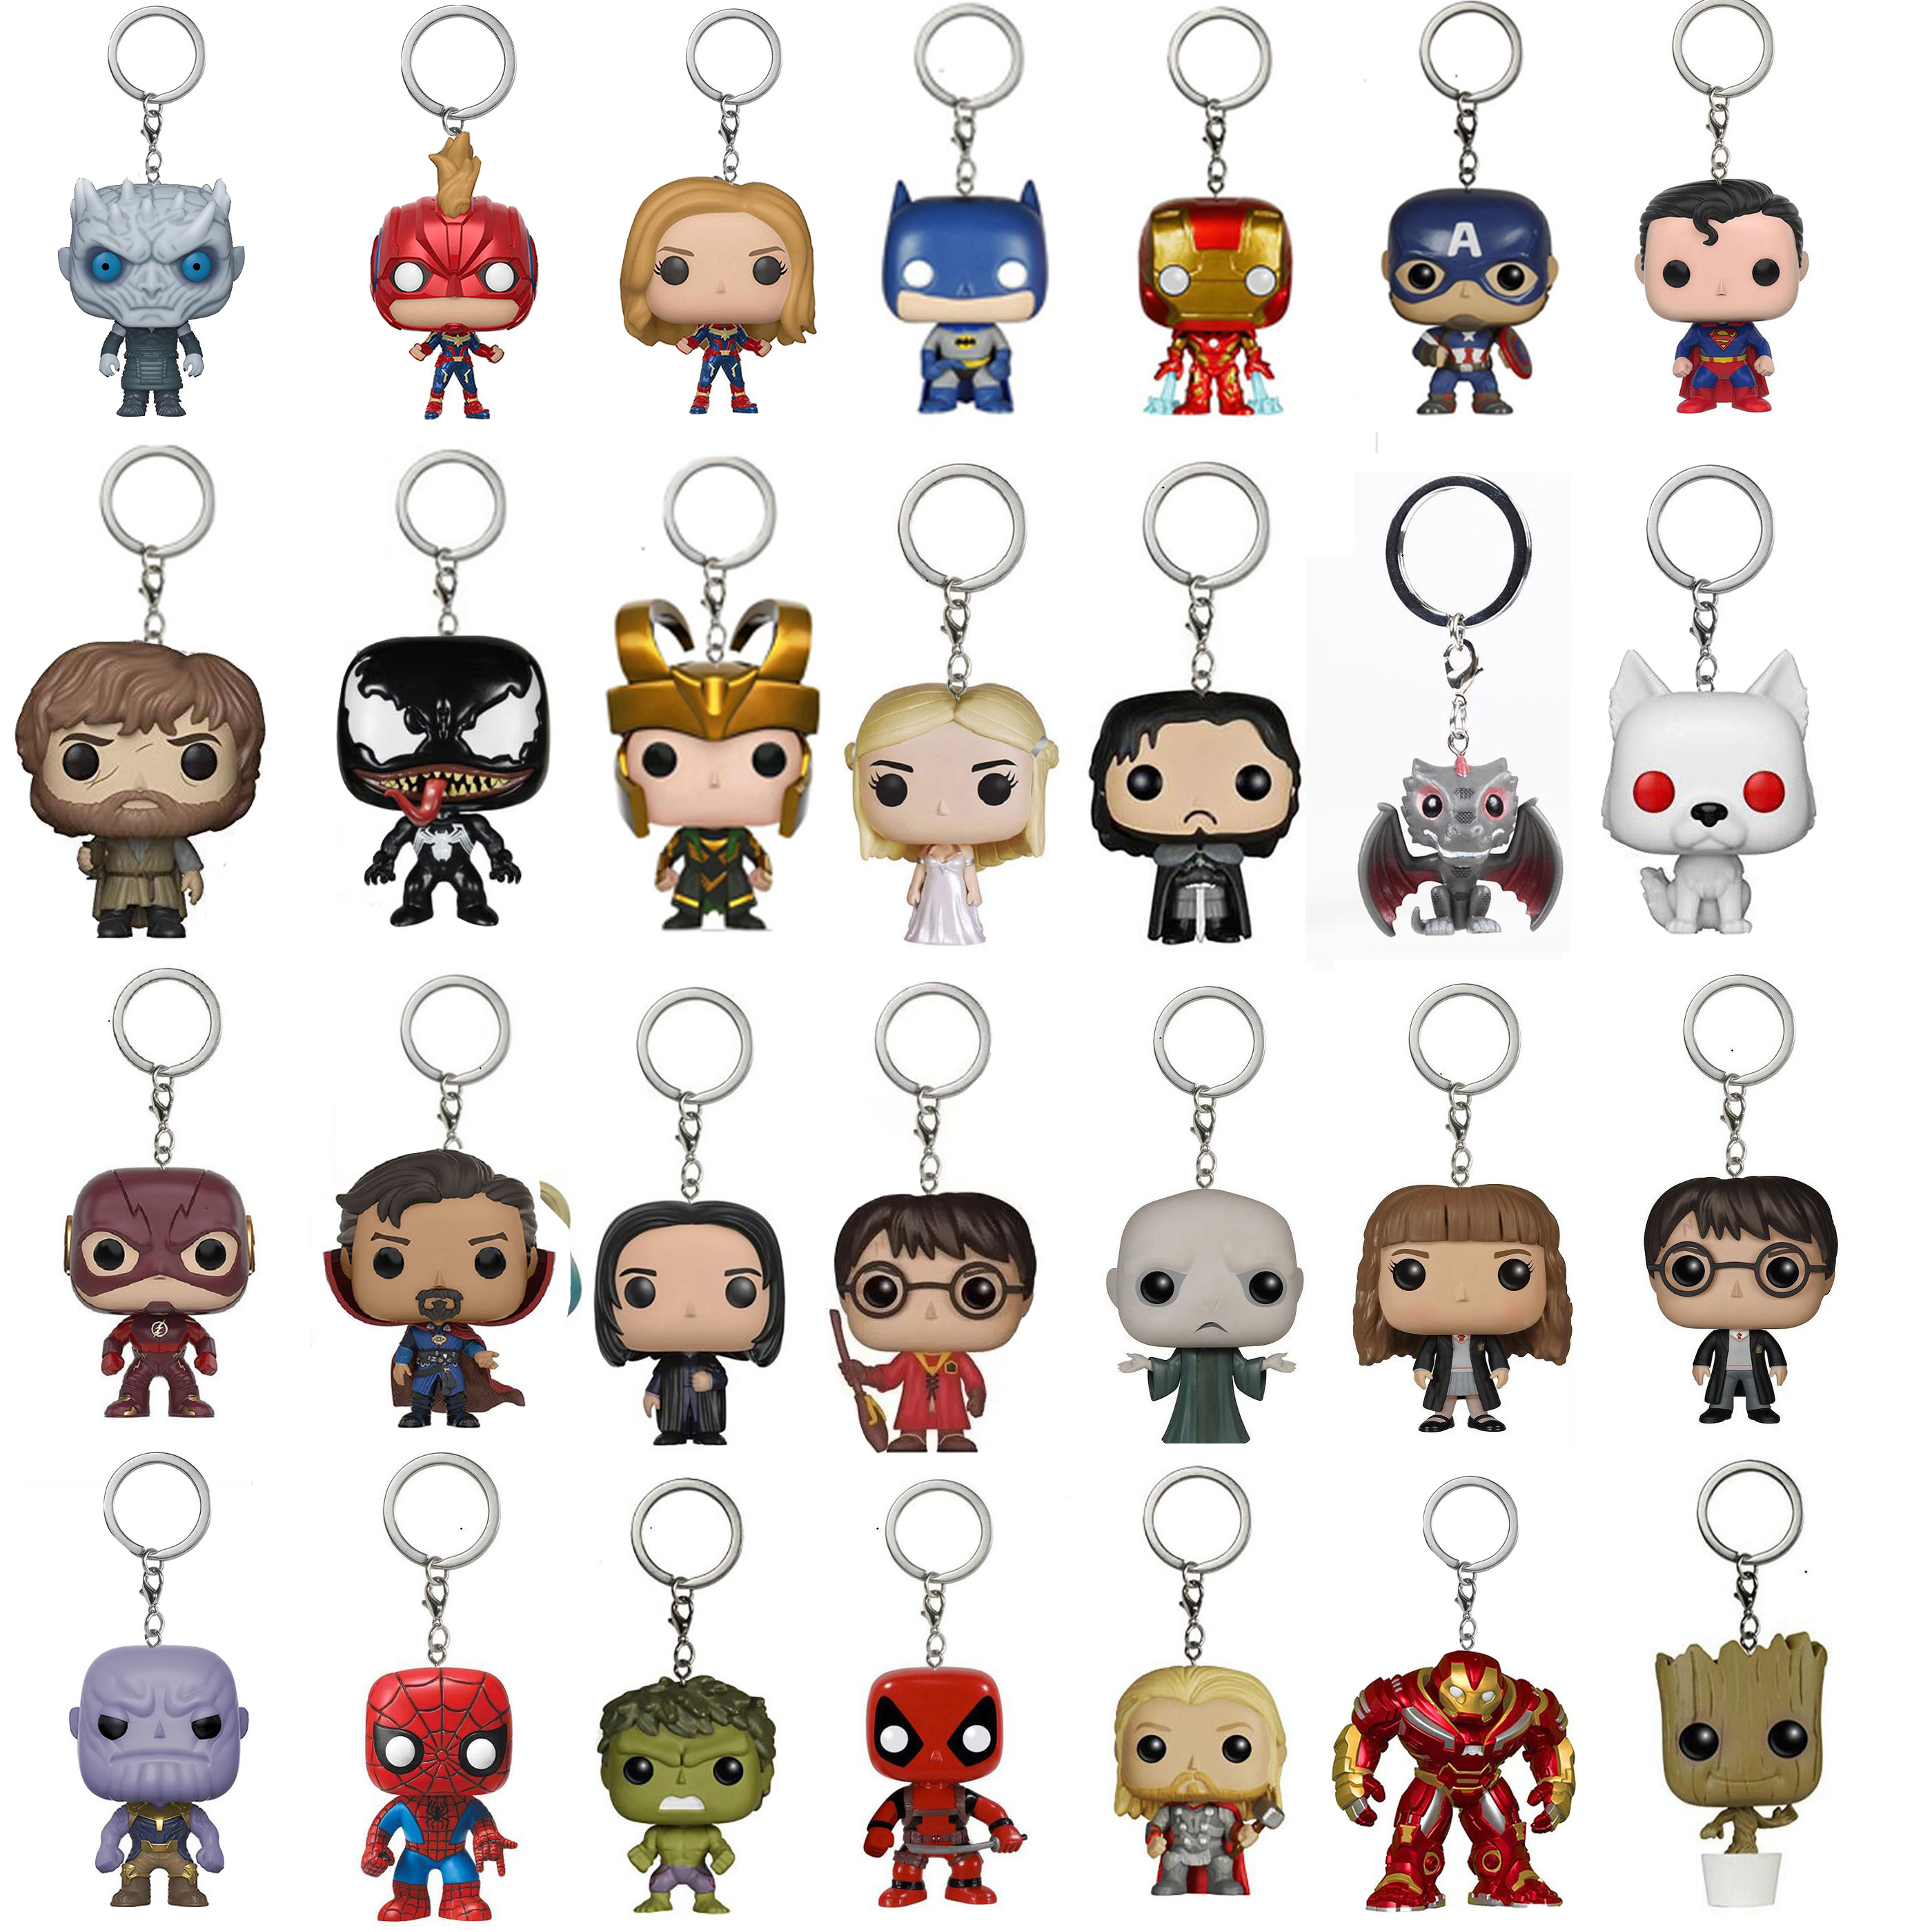 DC Marvel The Avengers 2 Super Heroes Keychain Toy Spider-man Batman Superman Deadpool Iron Man Hulk Captain America Vinyl Toys